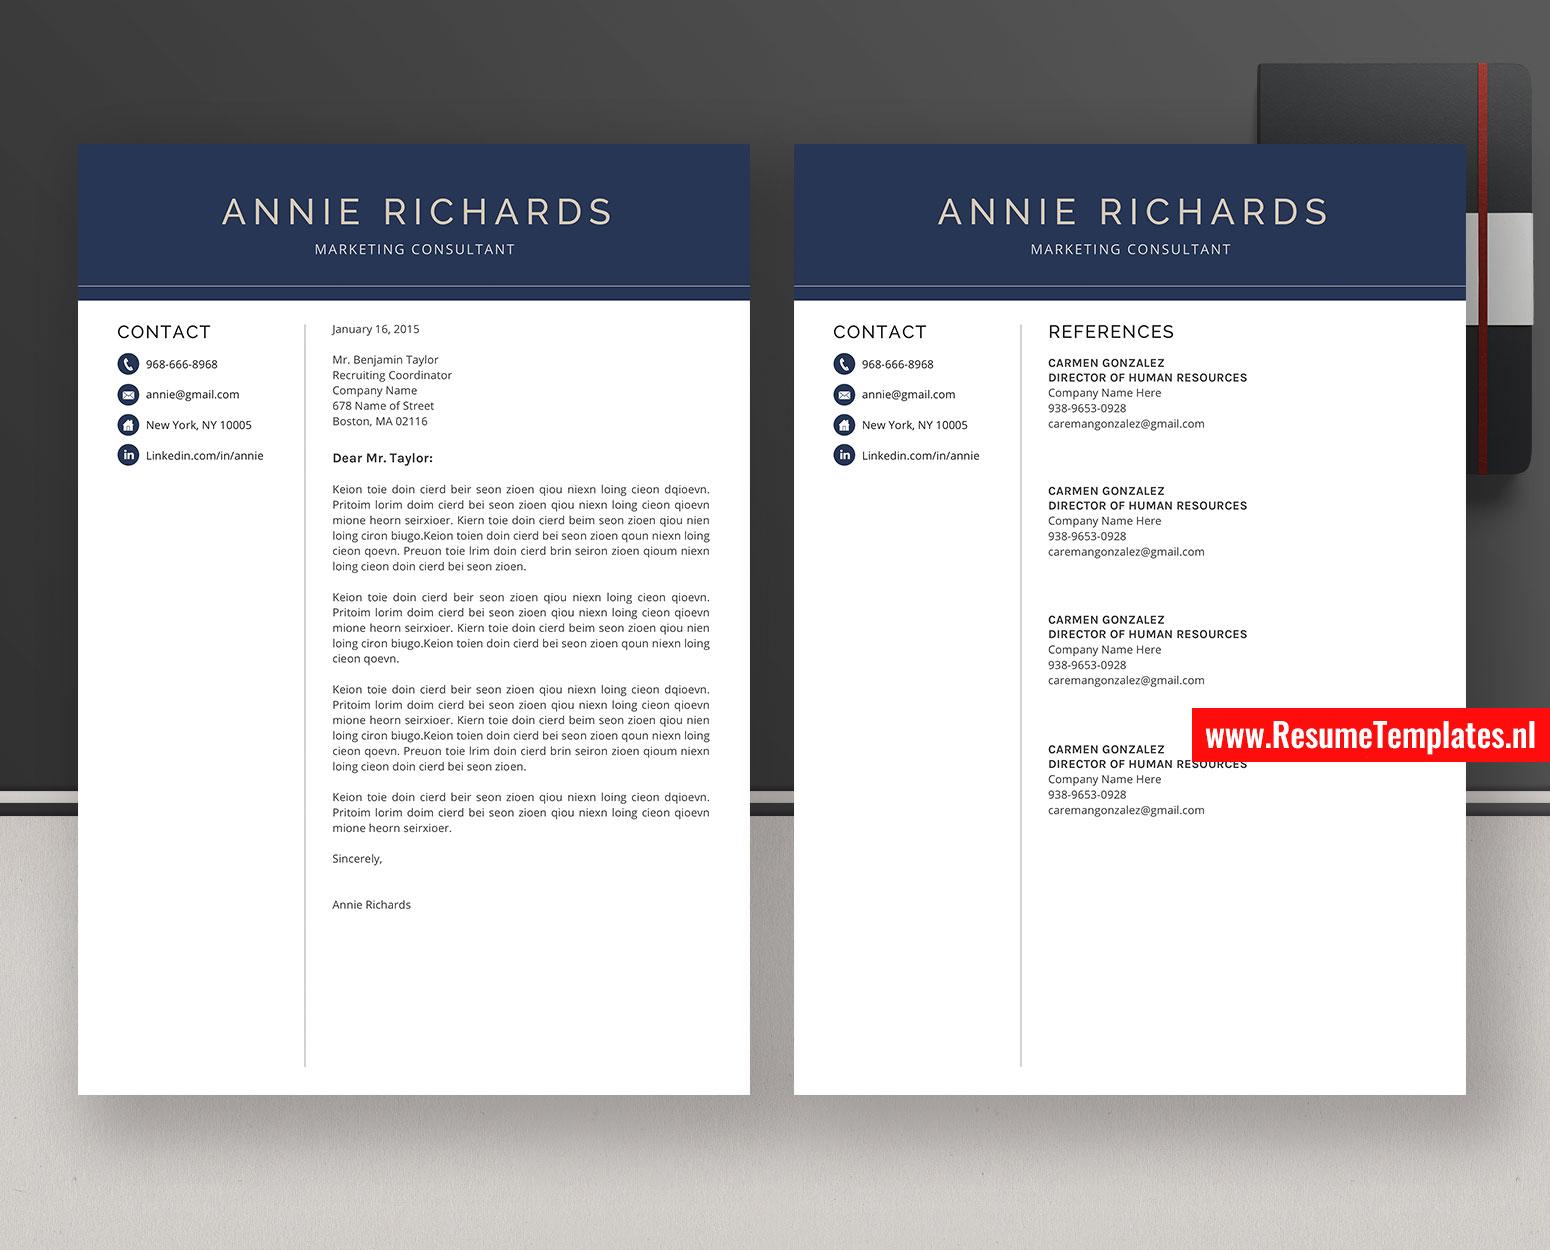 Cv Template Resume Template For Ms Word Professional Resume Simple Resume Modern Resume 1 3 Page Resume Design Teacher Resume Best Selling Resume Instant Download Resumetemplates Nl